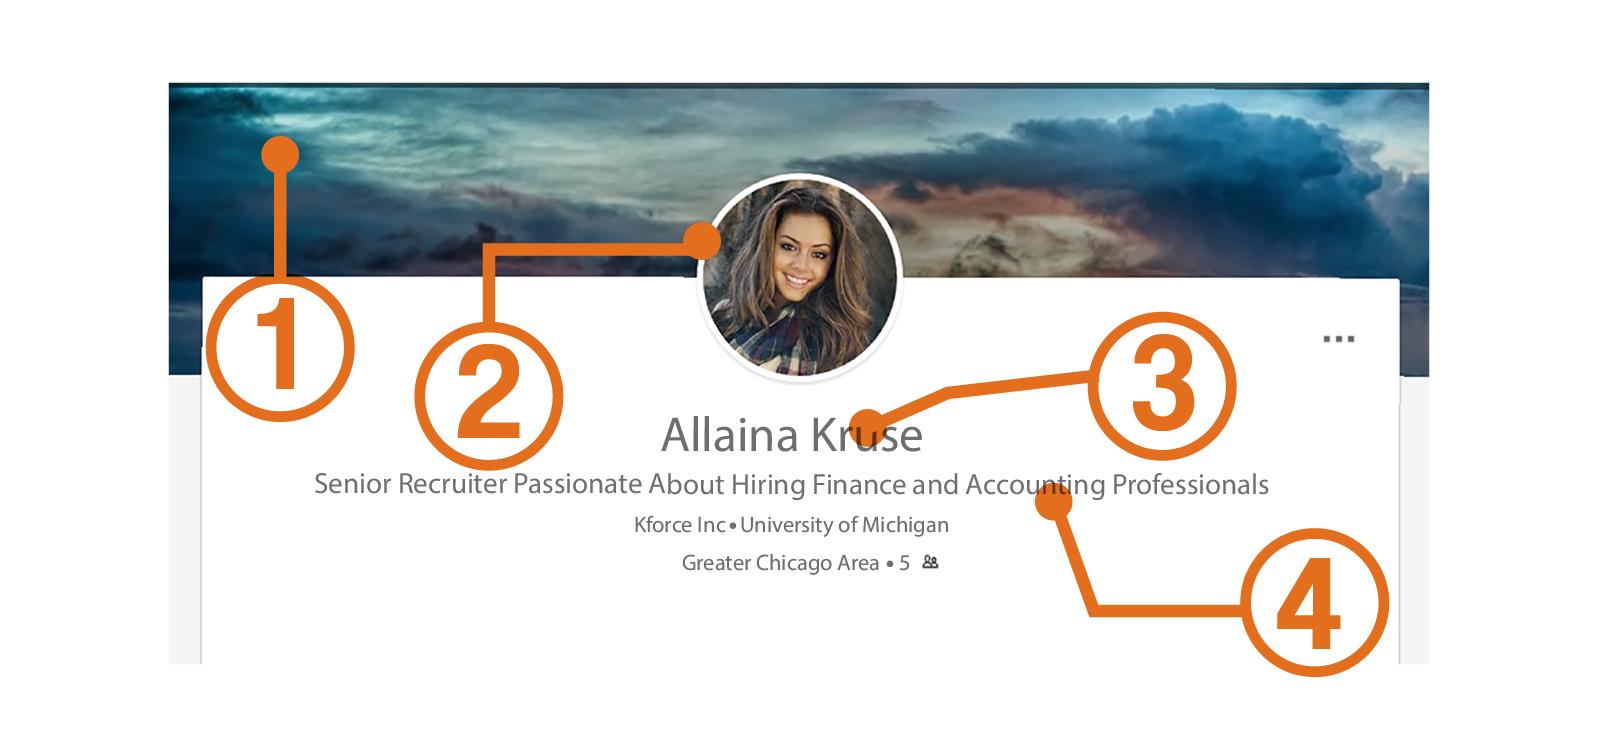 LinkedIn professional brand